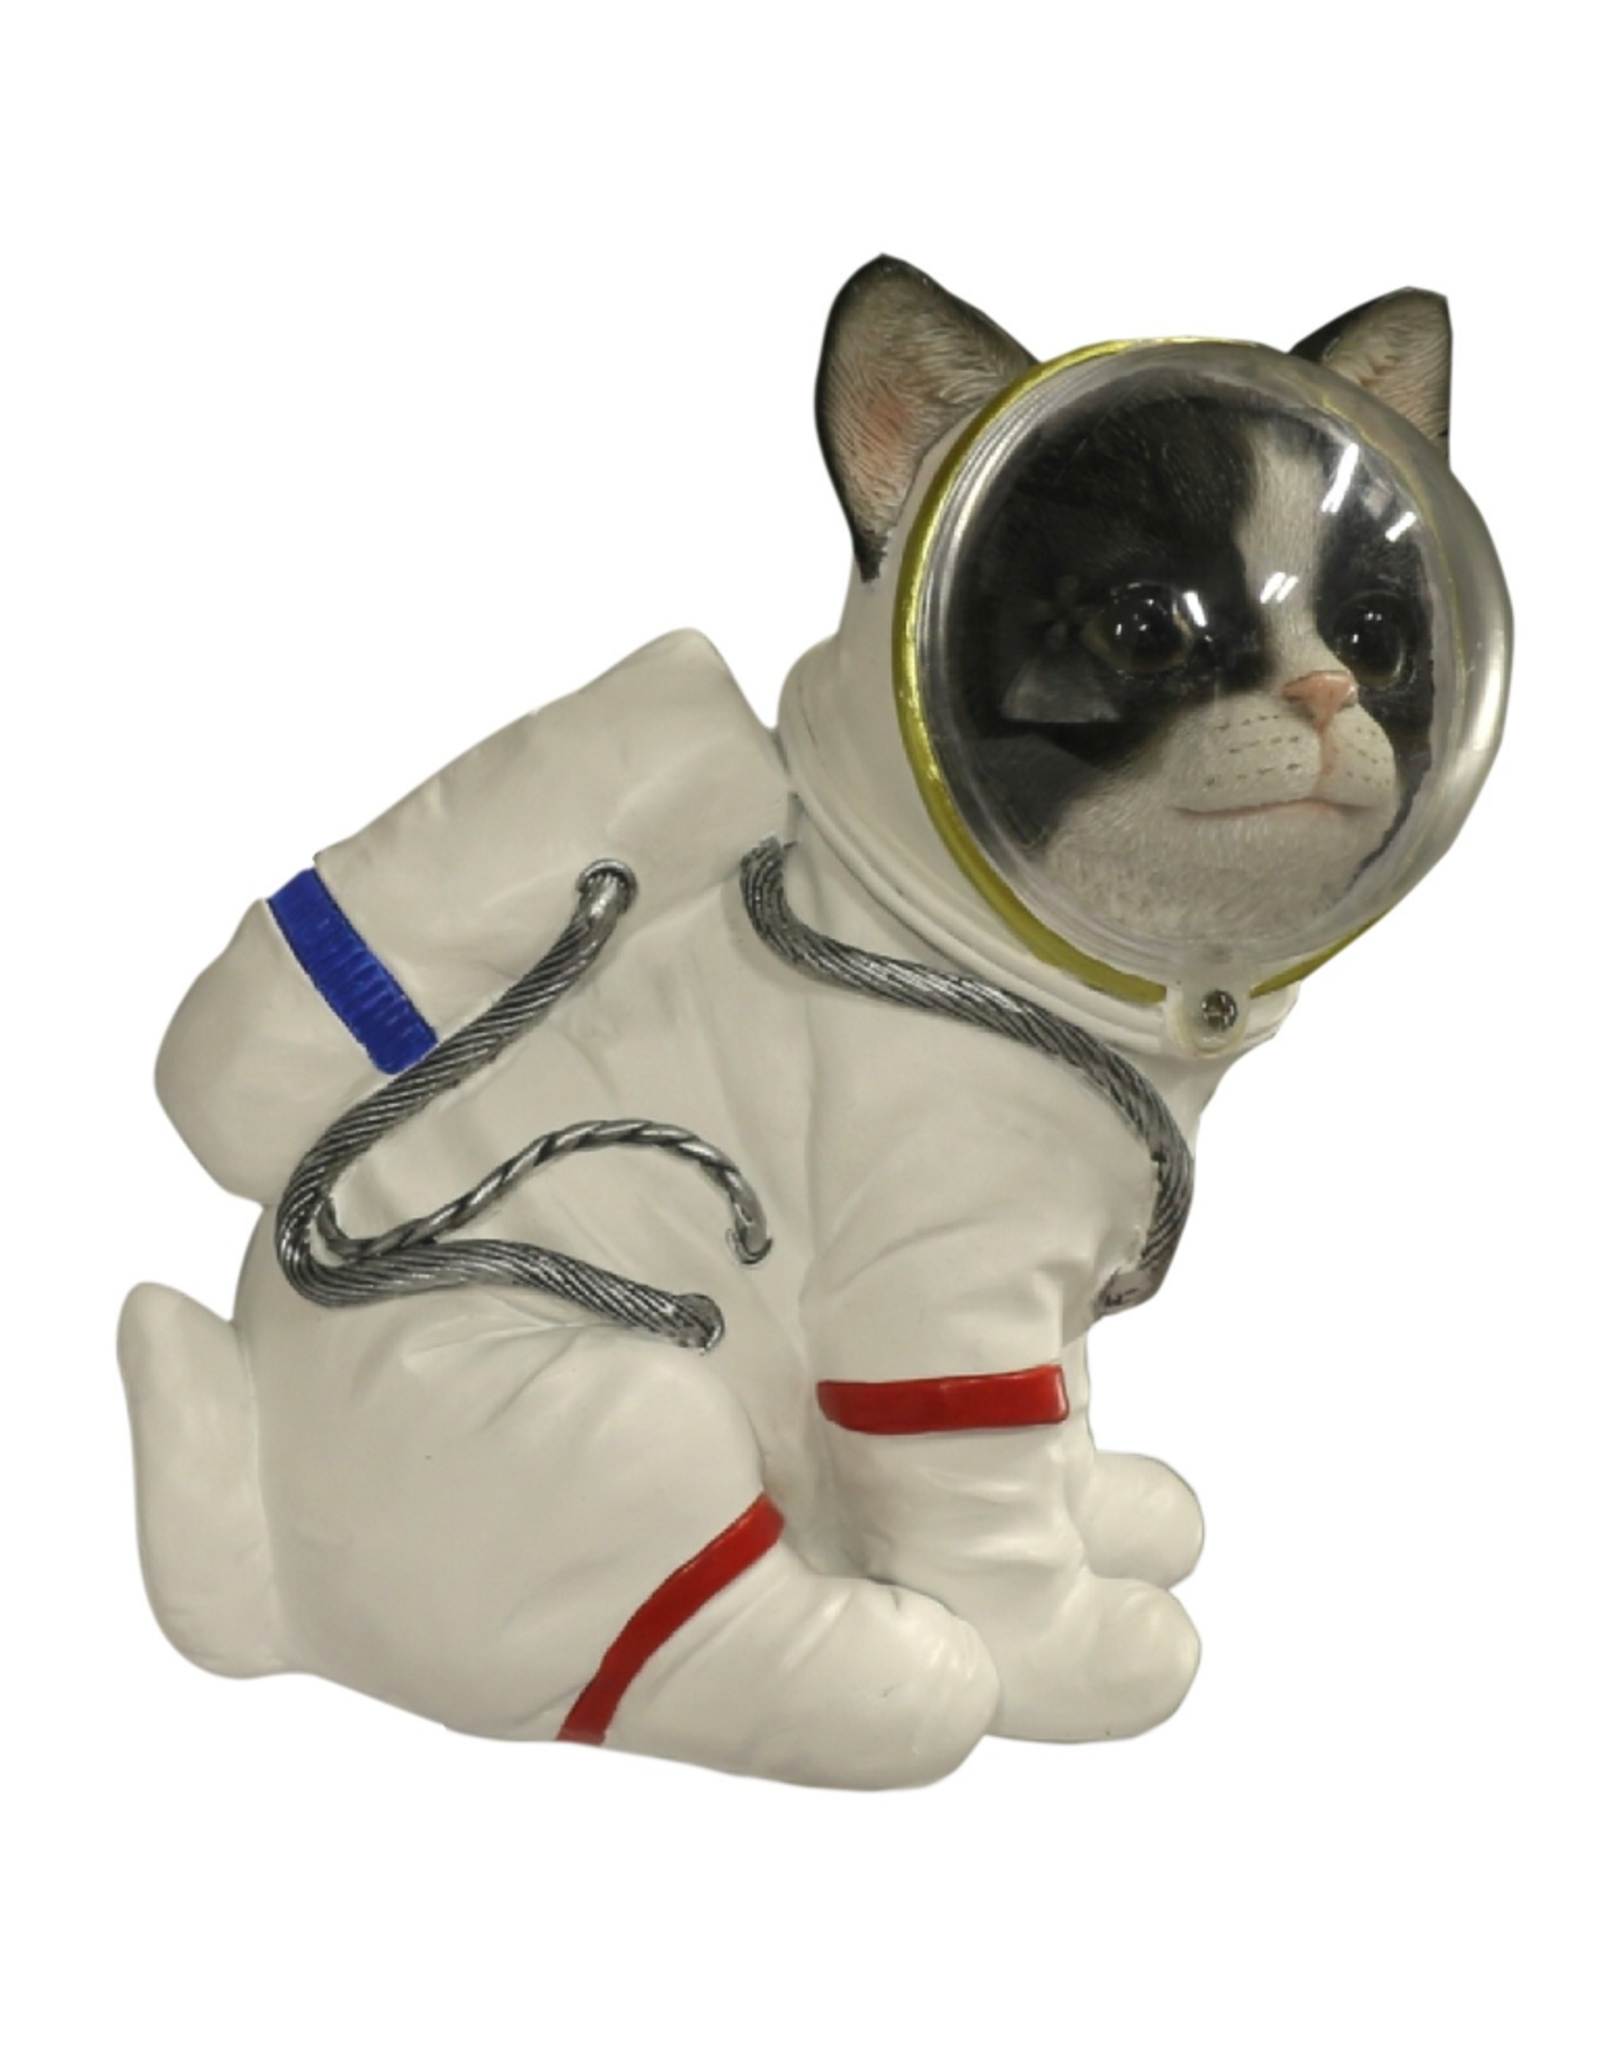 Trukado Giftware Figurines Collectables - Cat Astronaut figurine 17cm